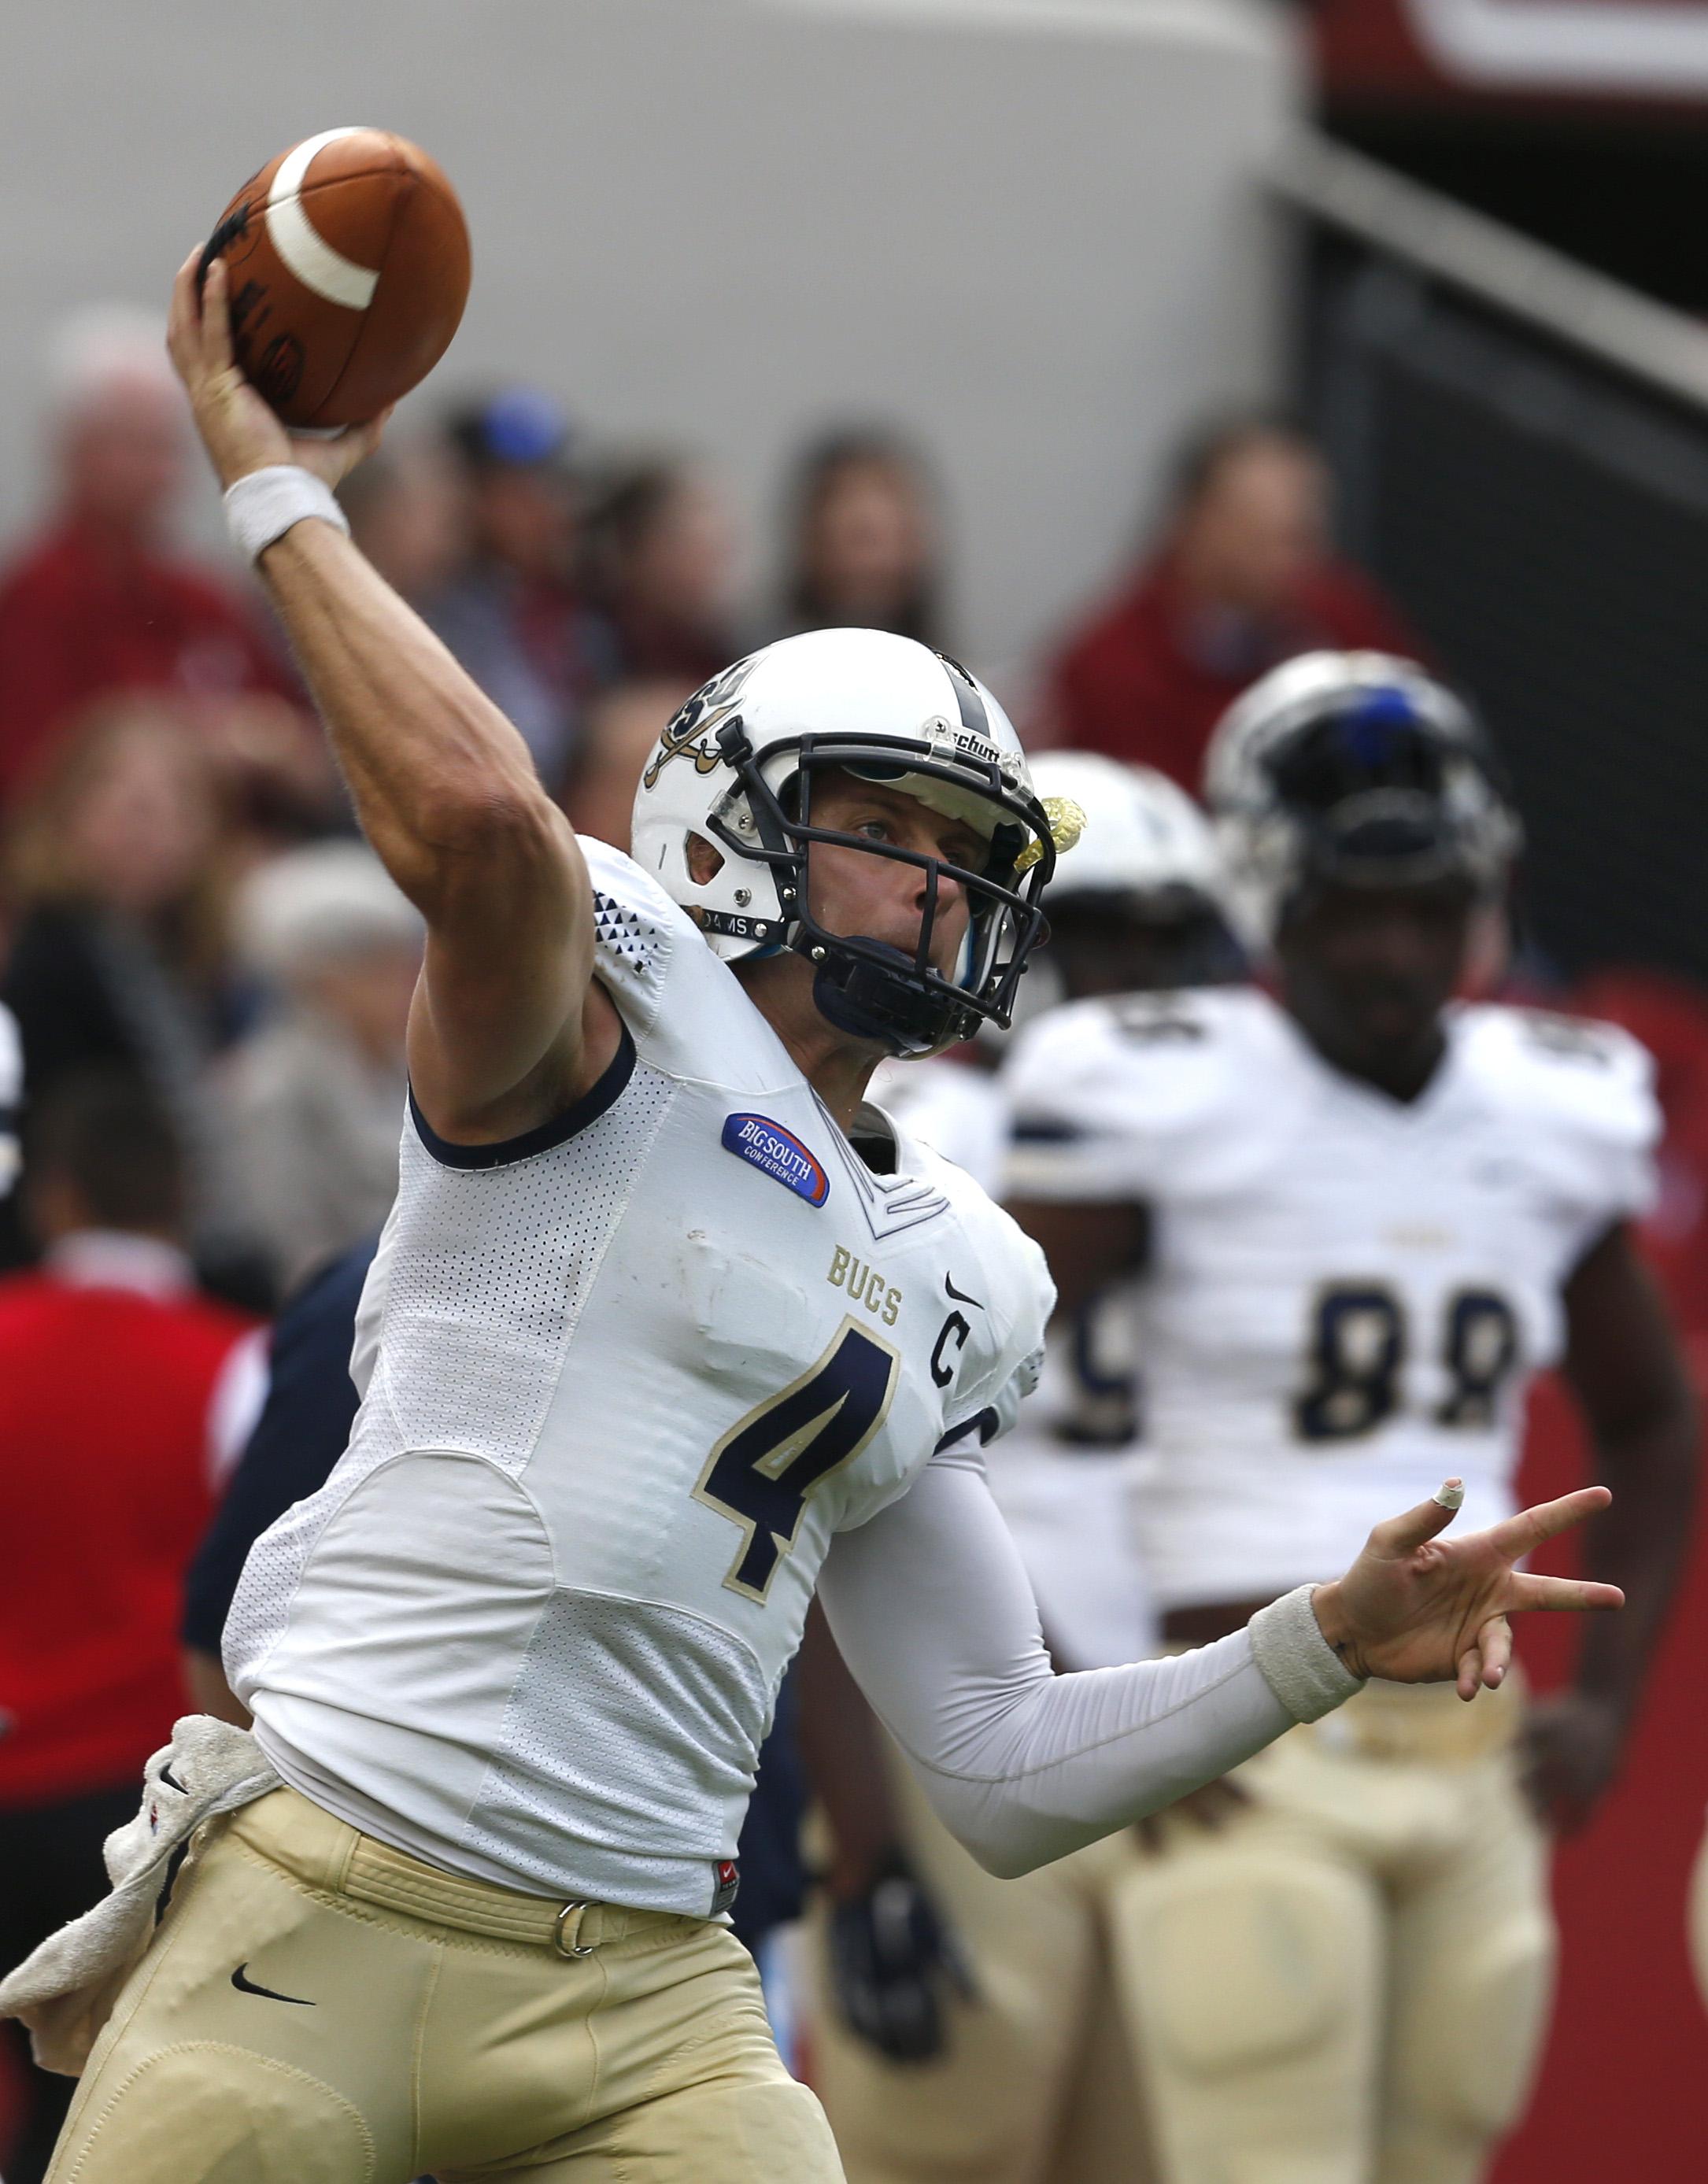 Charleston Southern quarterback Austin Brown (4) warms up before an NCAA football game against Alabama, Saturday, Nov. 21, 2015, in Tuscaloosa, Ala. (AP Photo/Butch Dill)